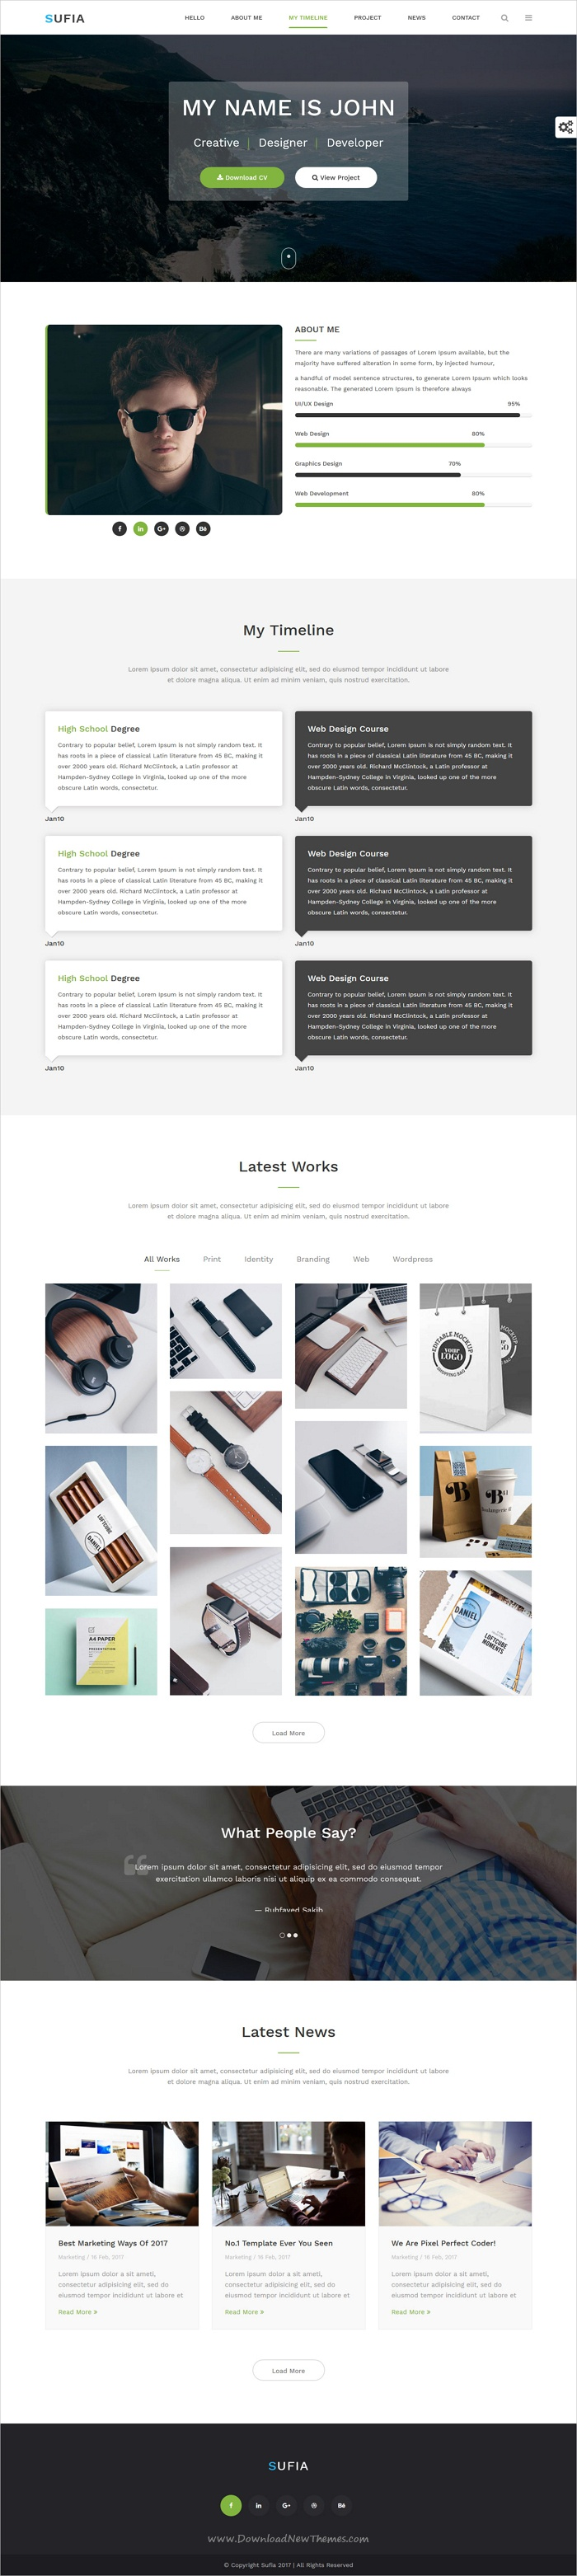 Sufia - Responsive Multipurpose HTML5 Template | Modern, Corporate ...